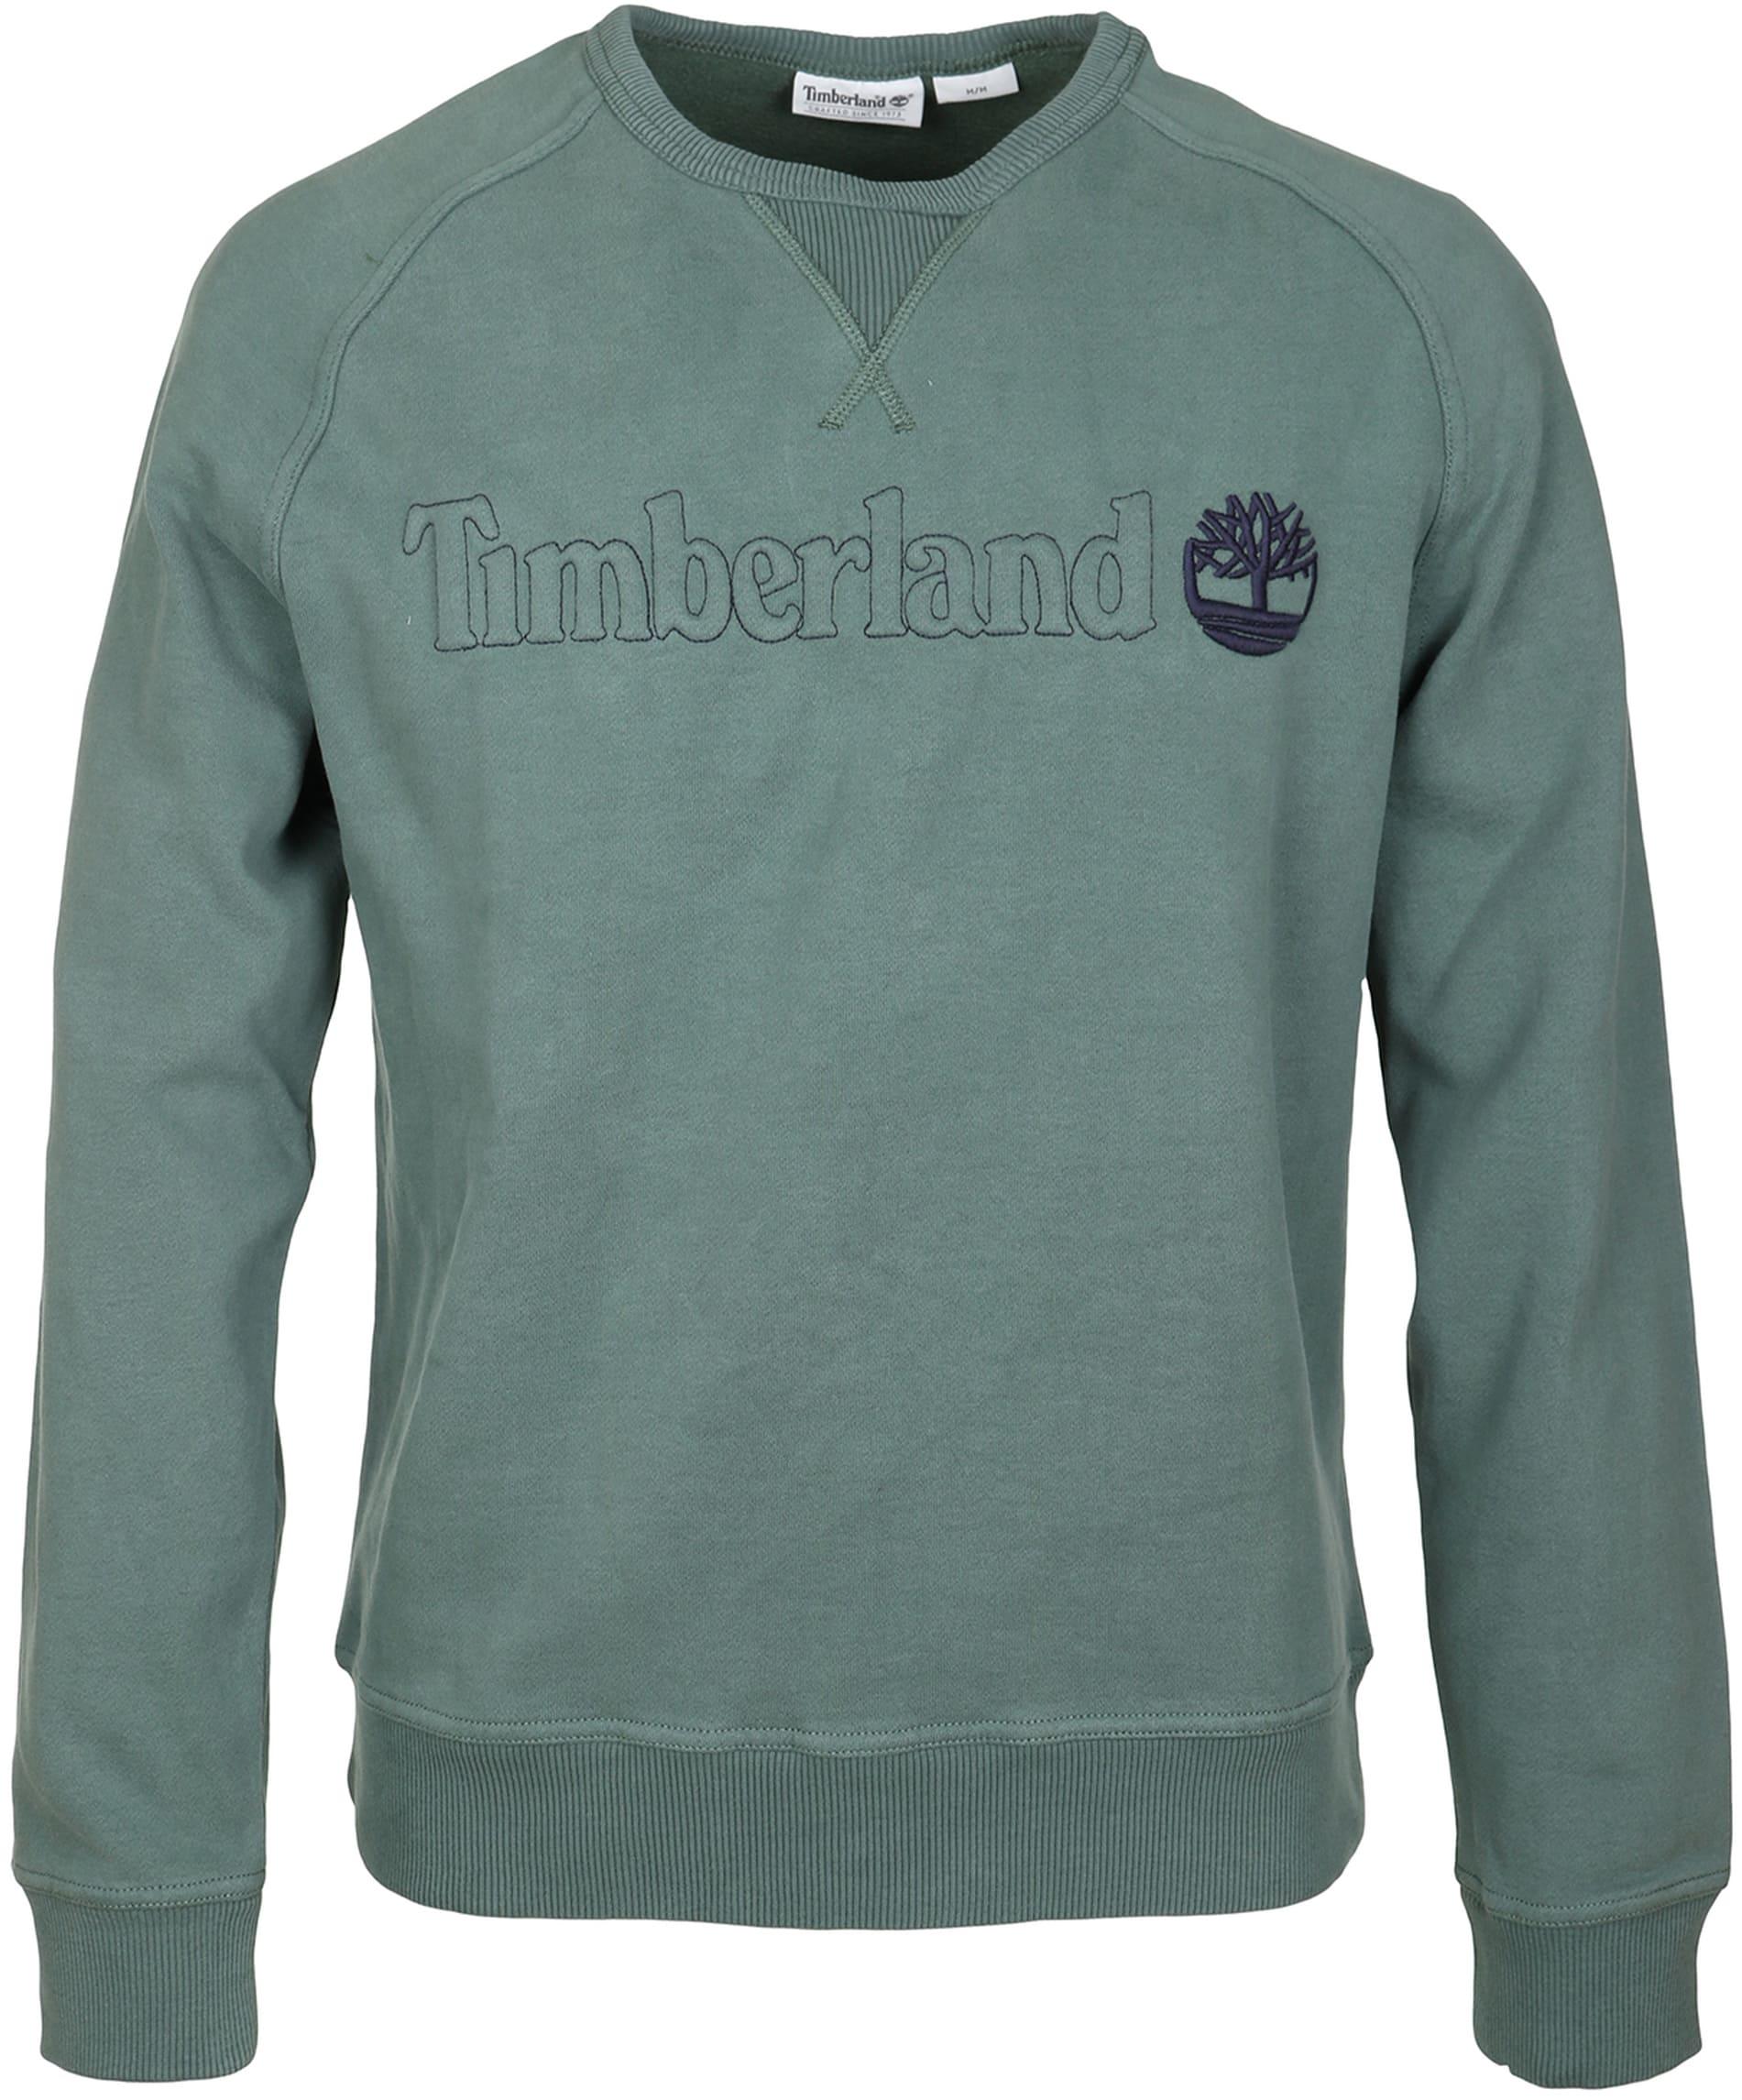 Timberland Sweatshirt Grün Raglan foto 0